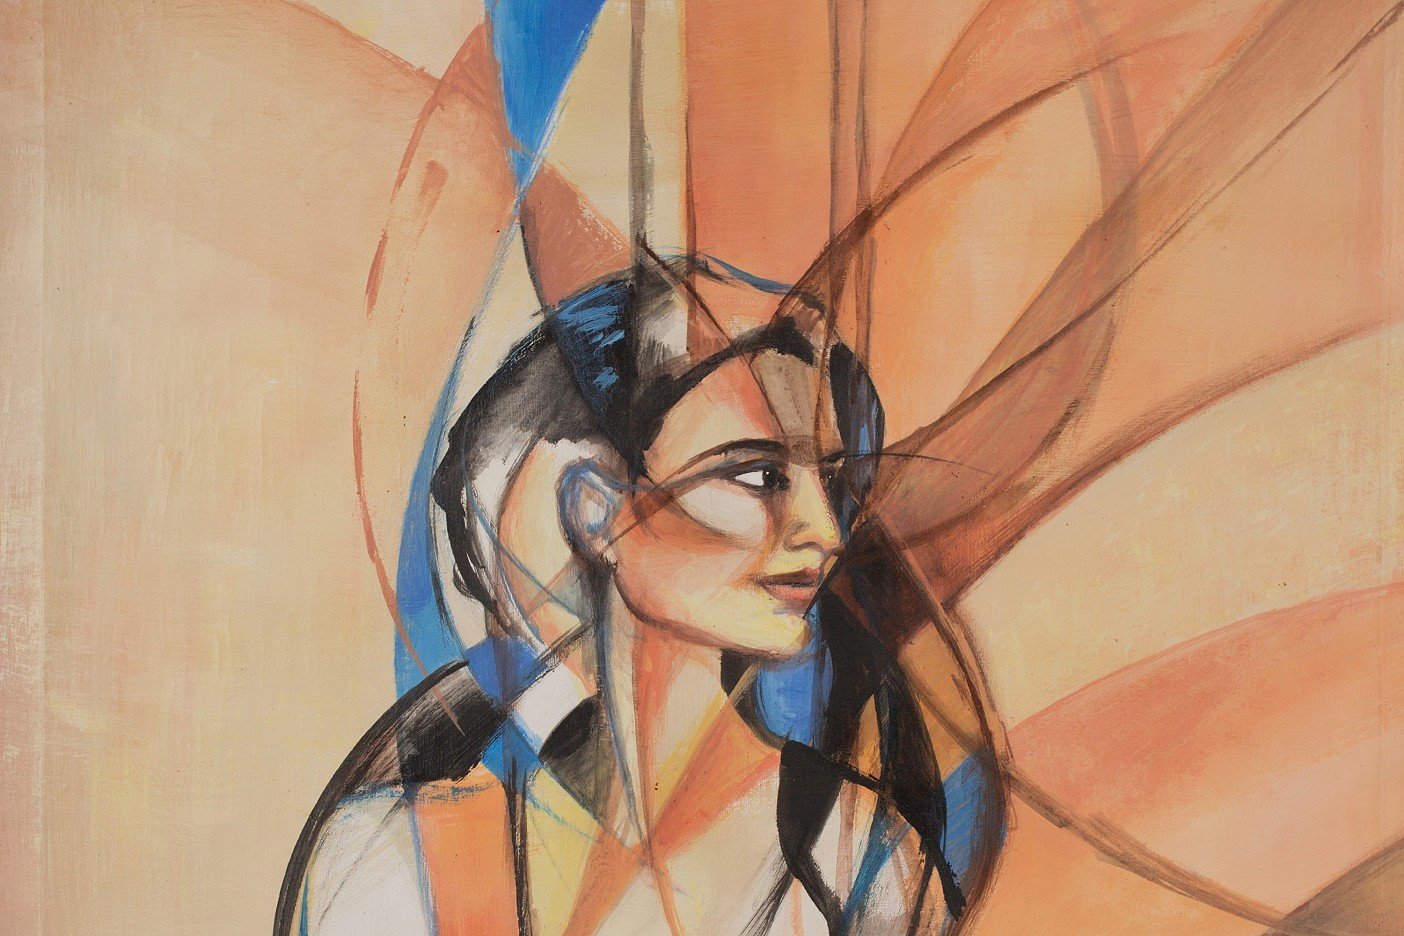 Femme 2